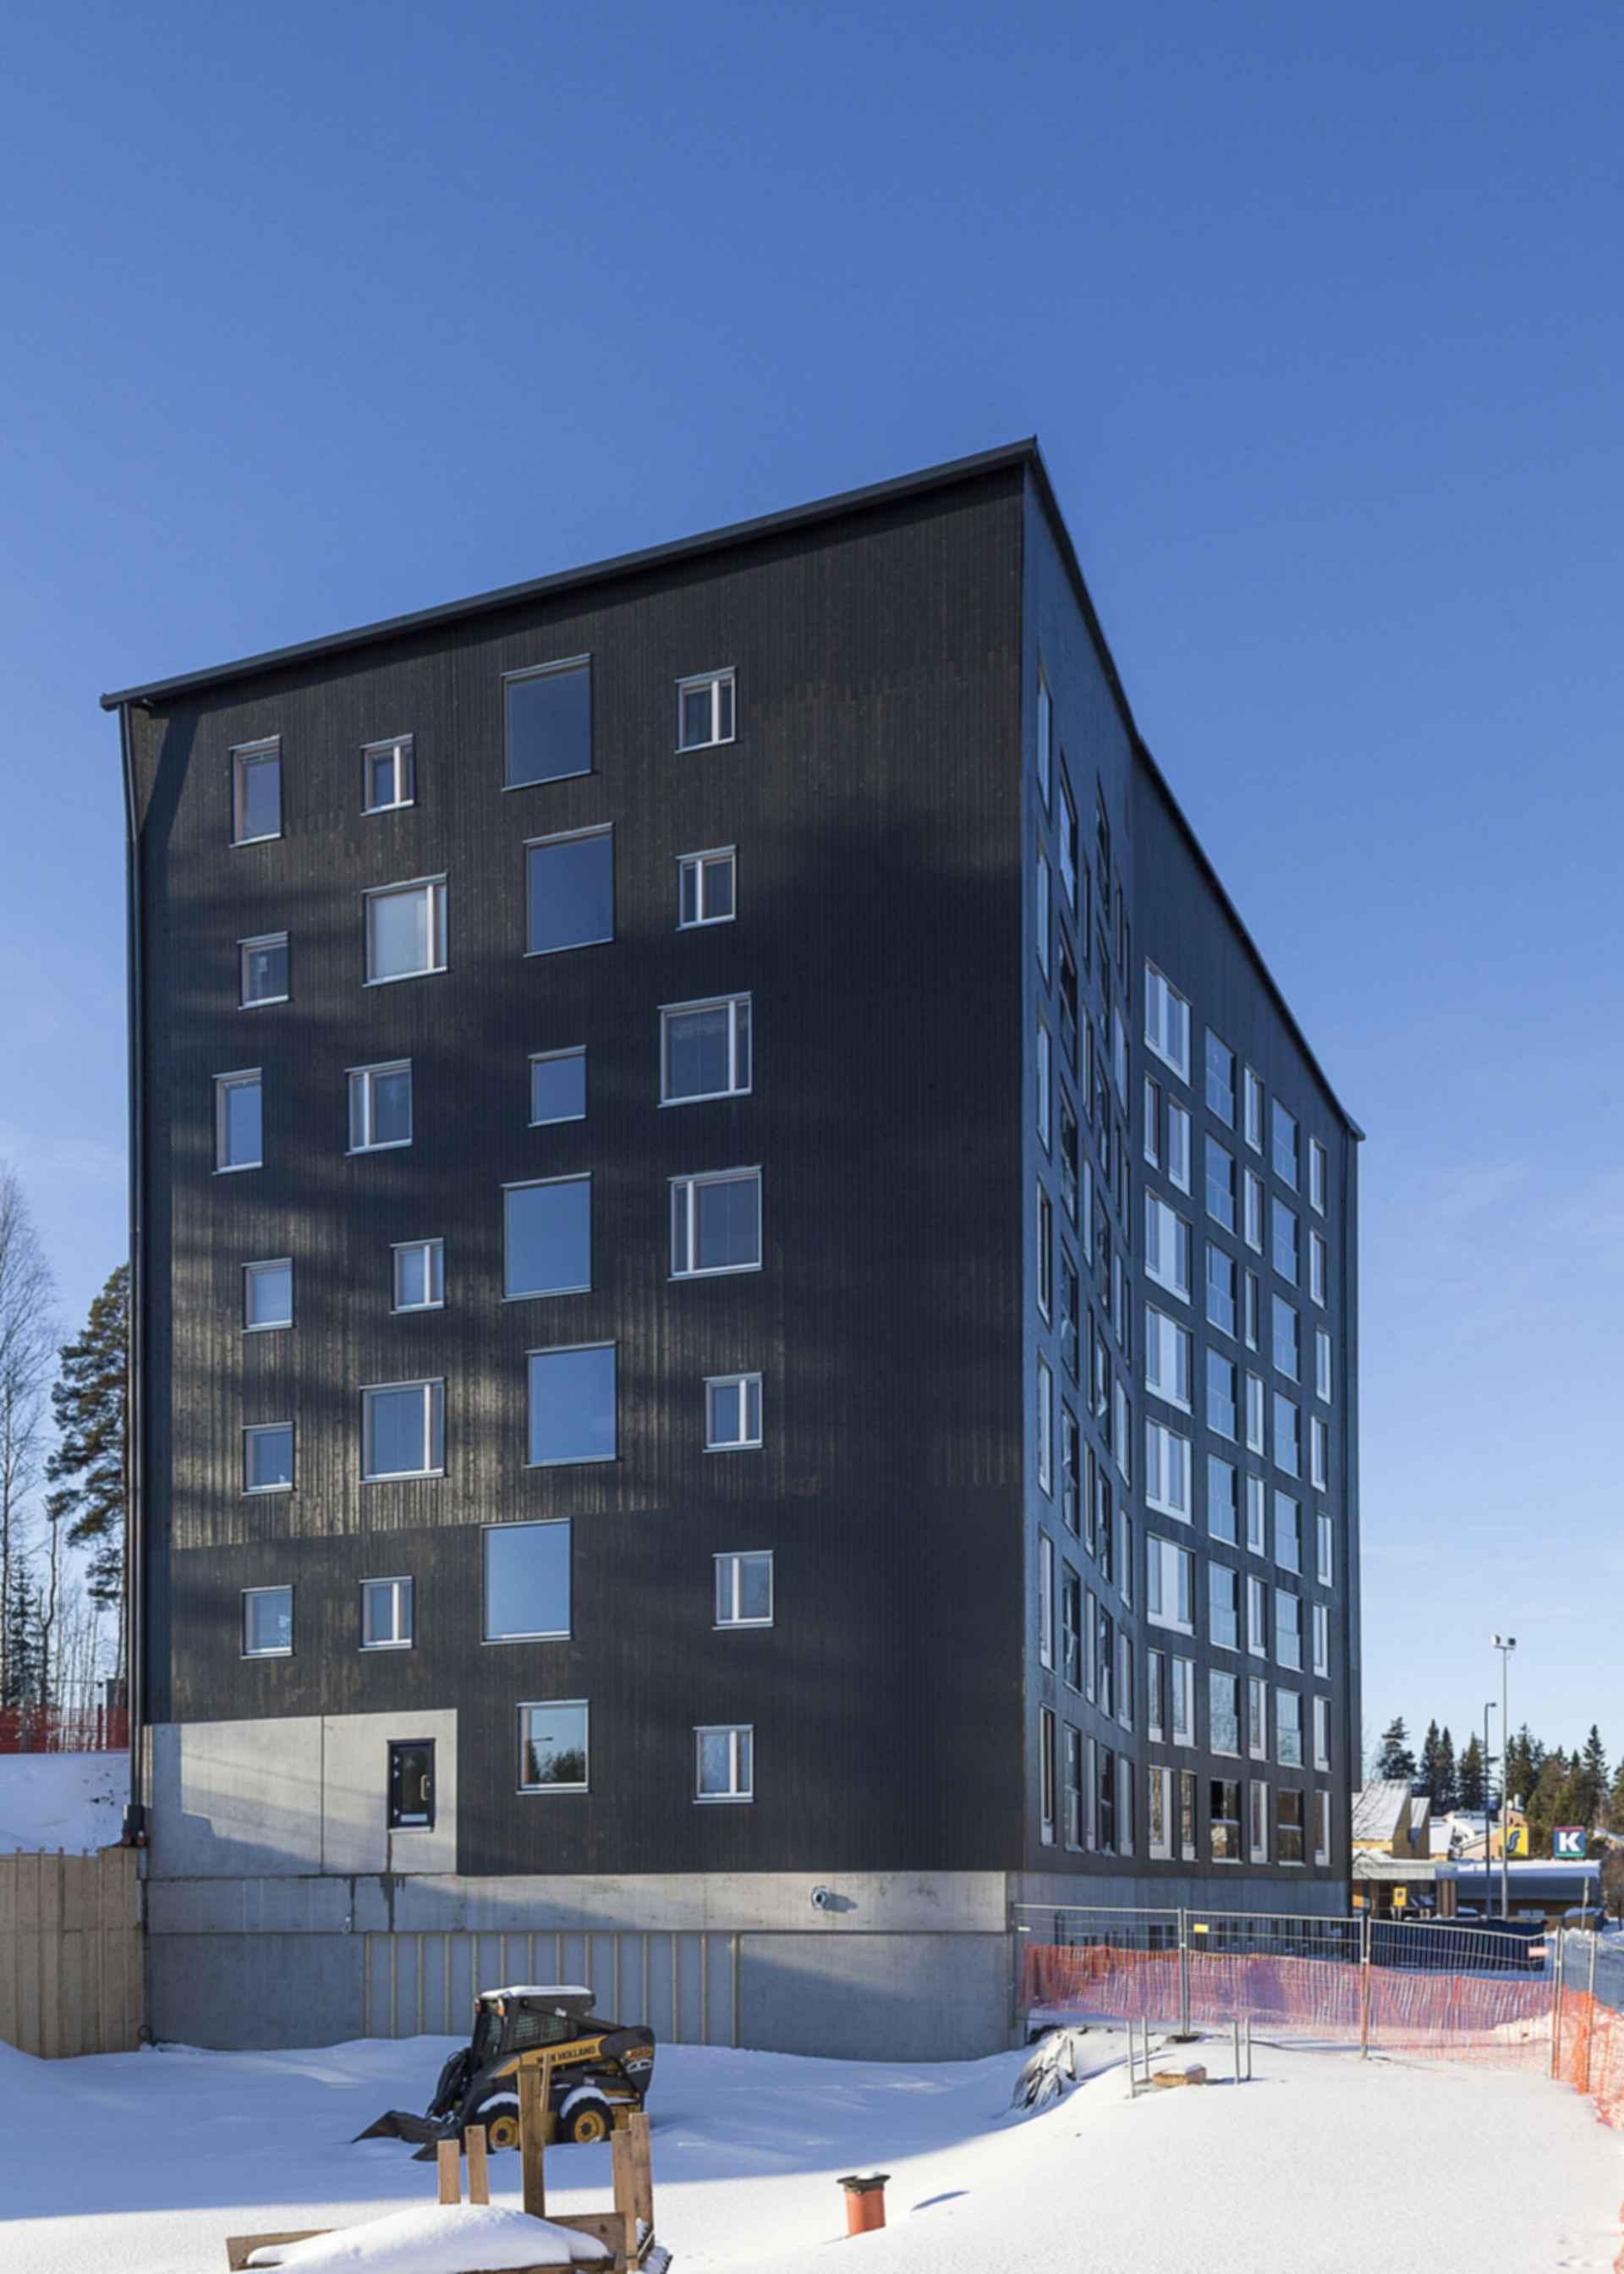 Puukuokka Housing Block - Exterior/Construction